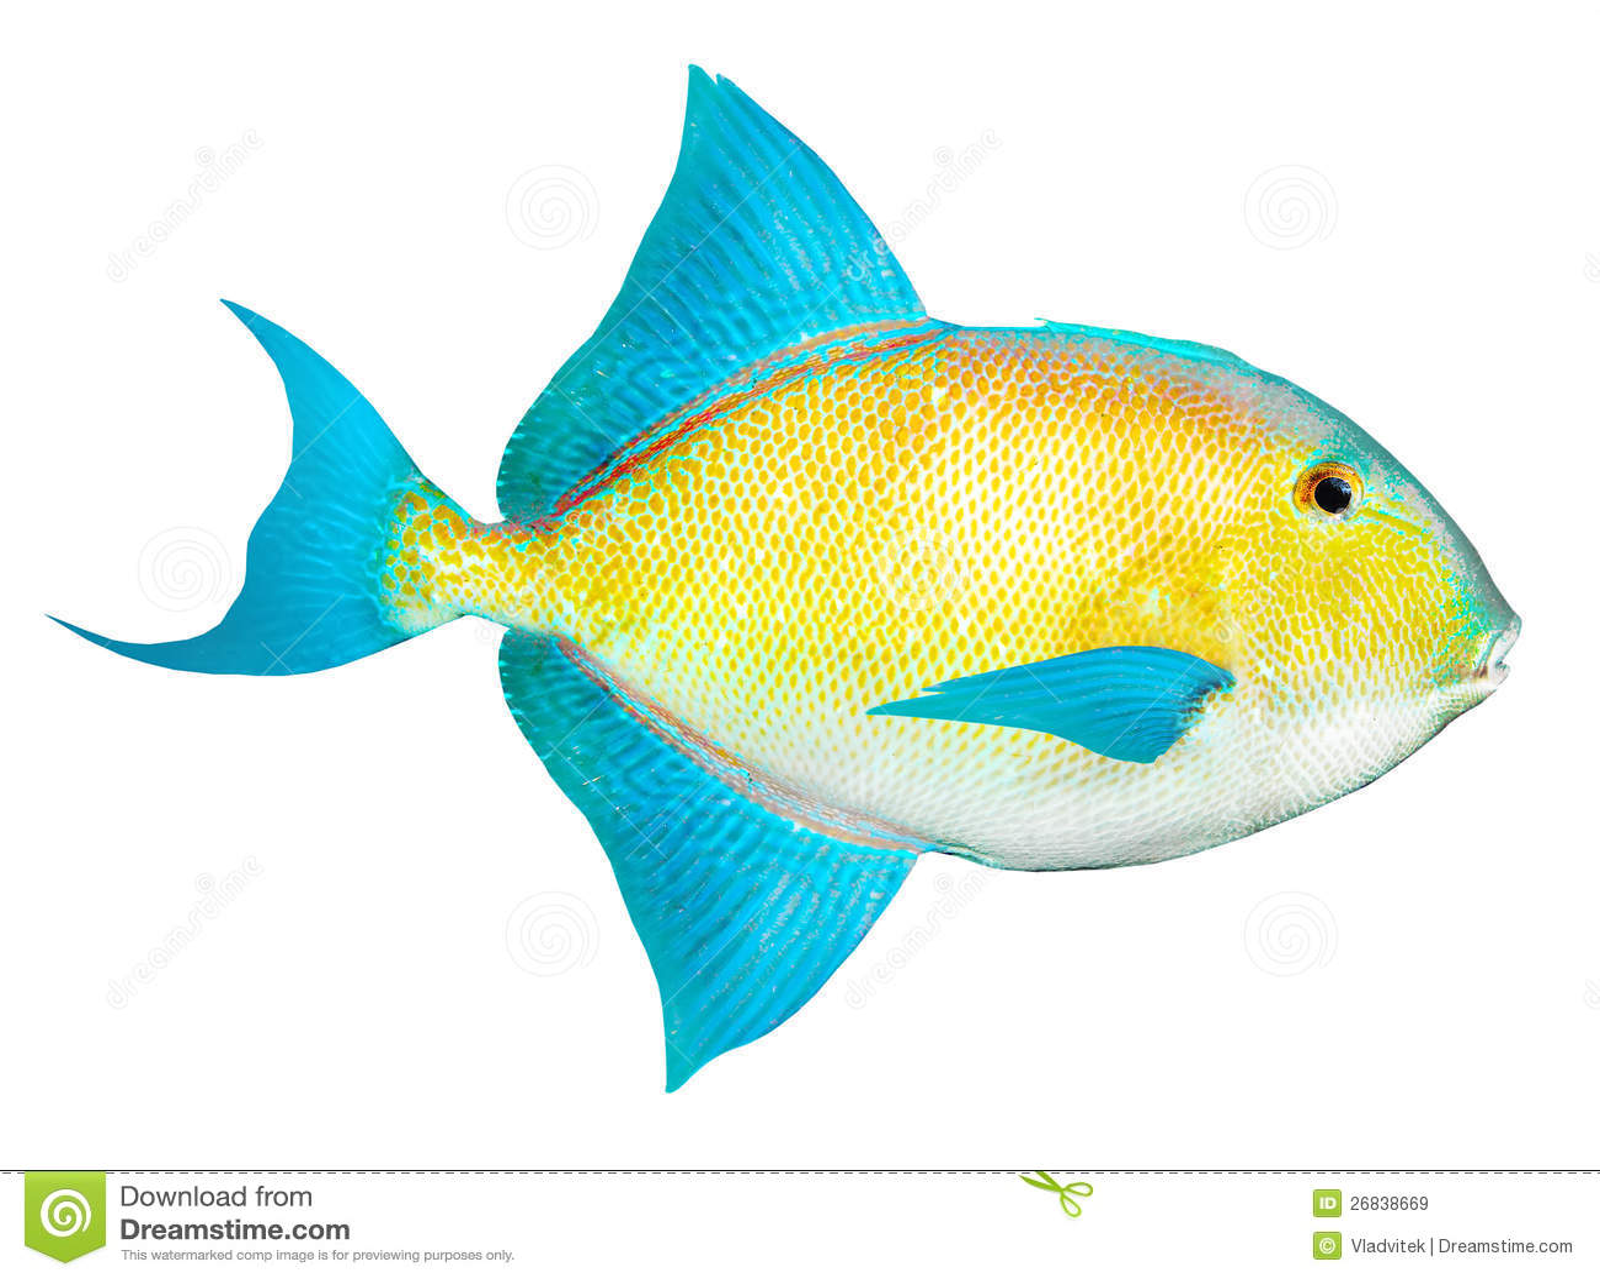 poissons tropicaux de mer des cara bes image stock image du fond aquatique 26838669. Black Bedroom Furniture Sets. Home Design Ideas